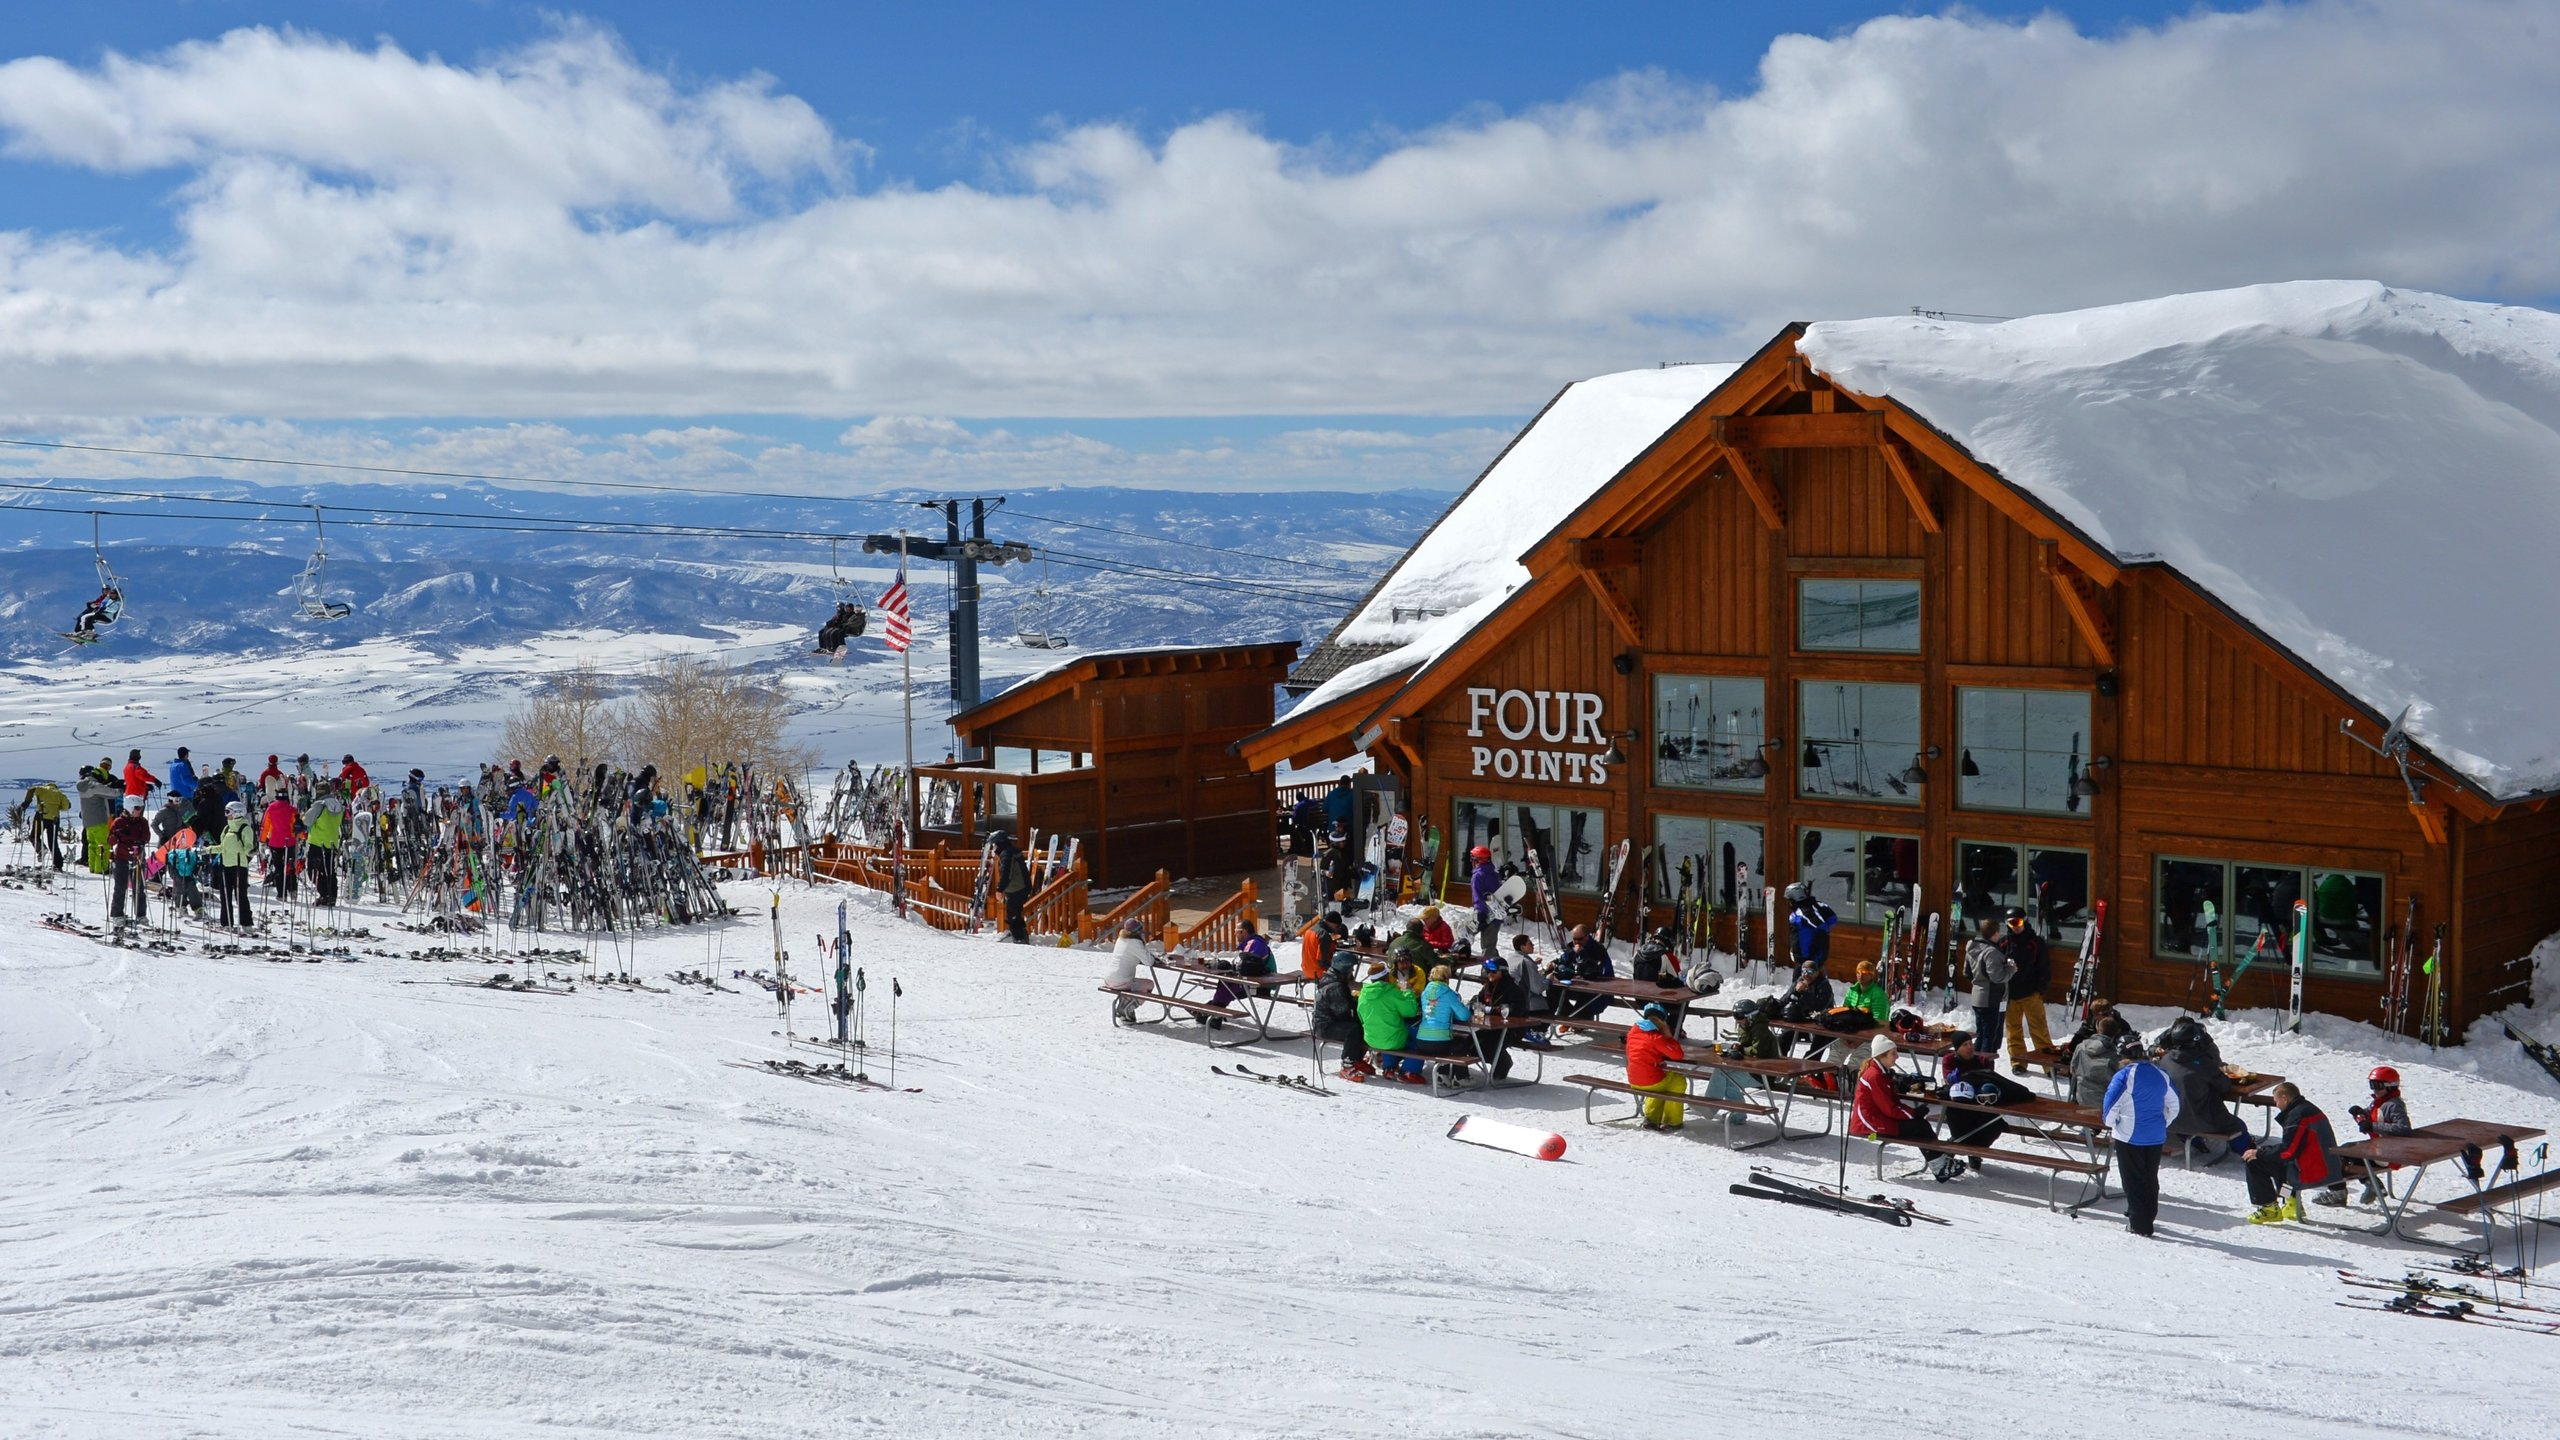 Steamboat skiområde, Steamboat Springs, Colorado, USA